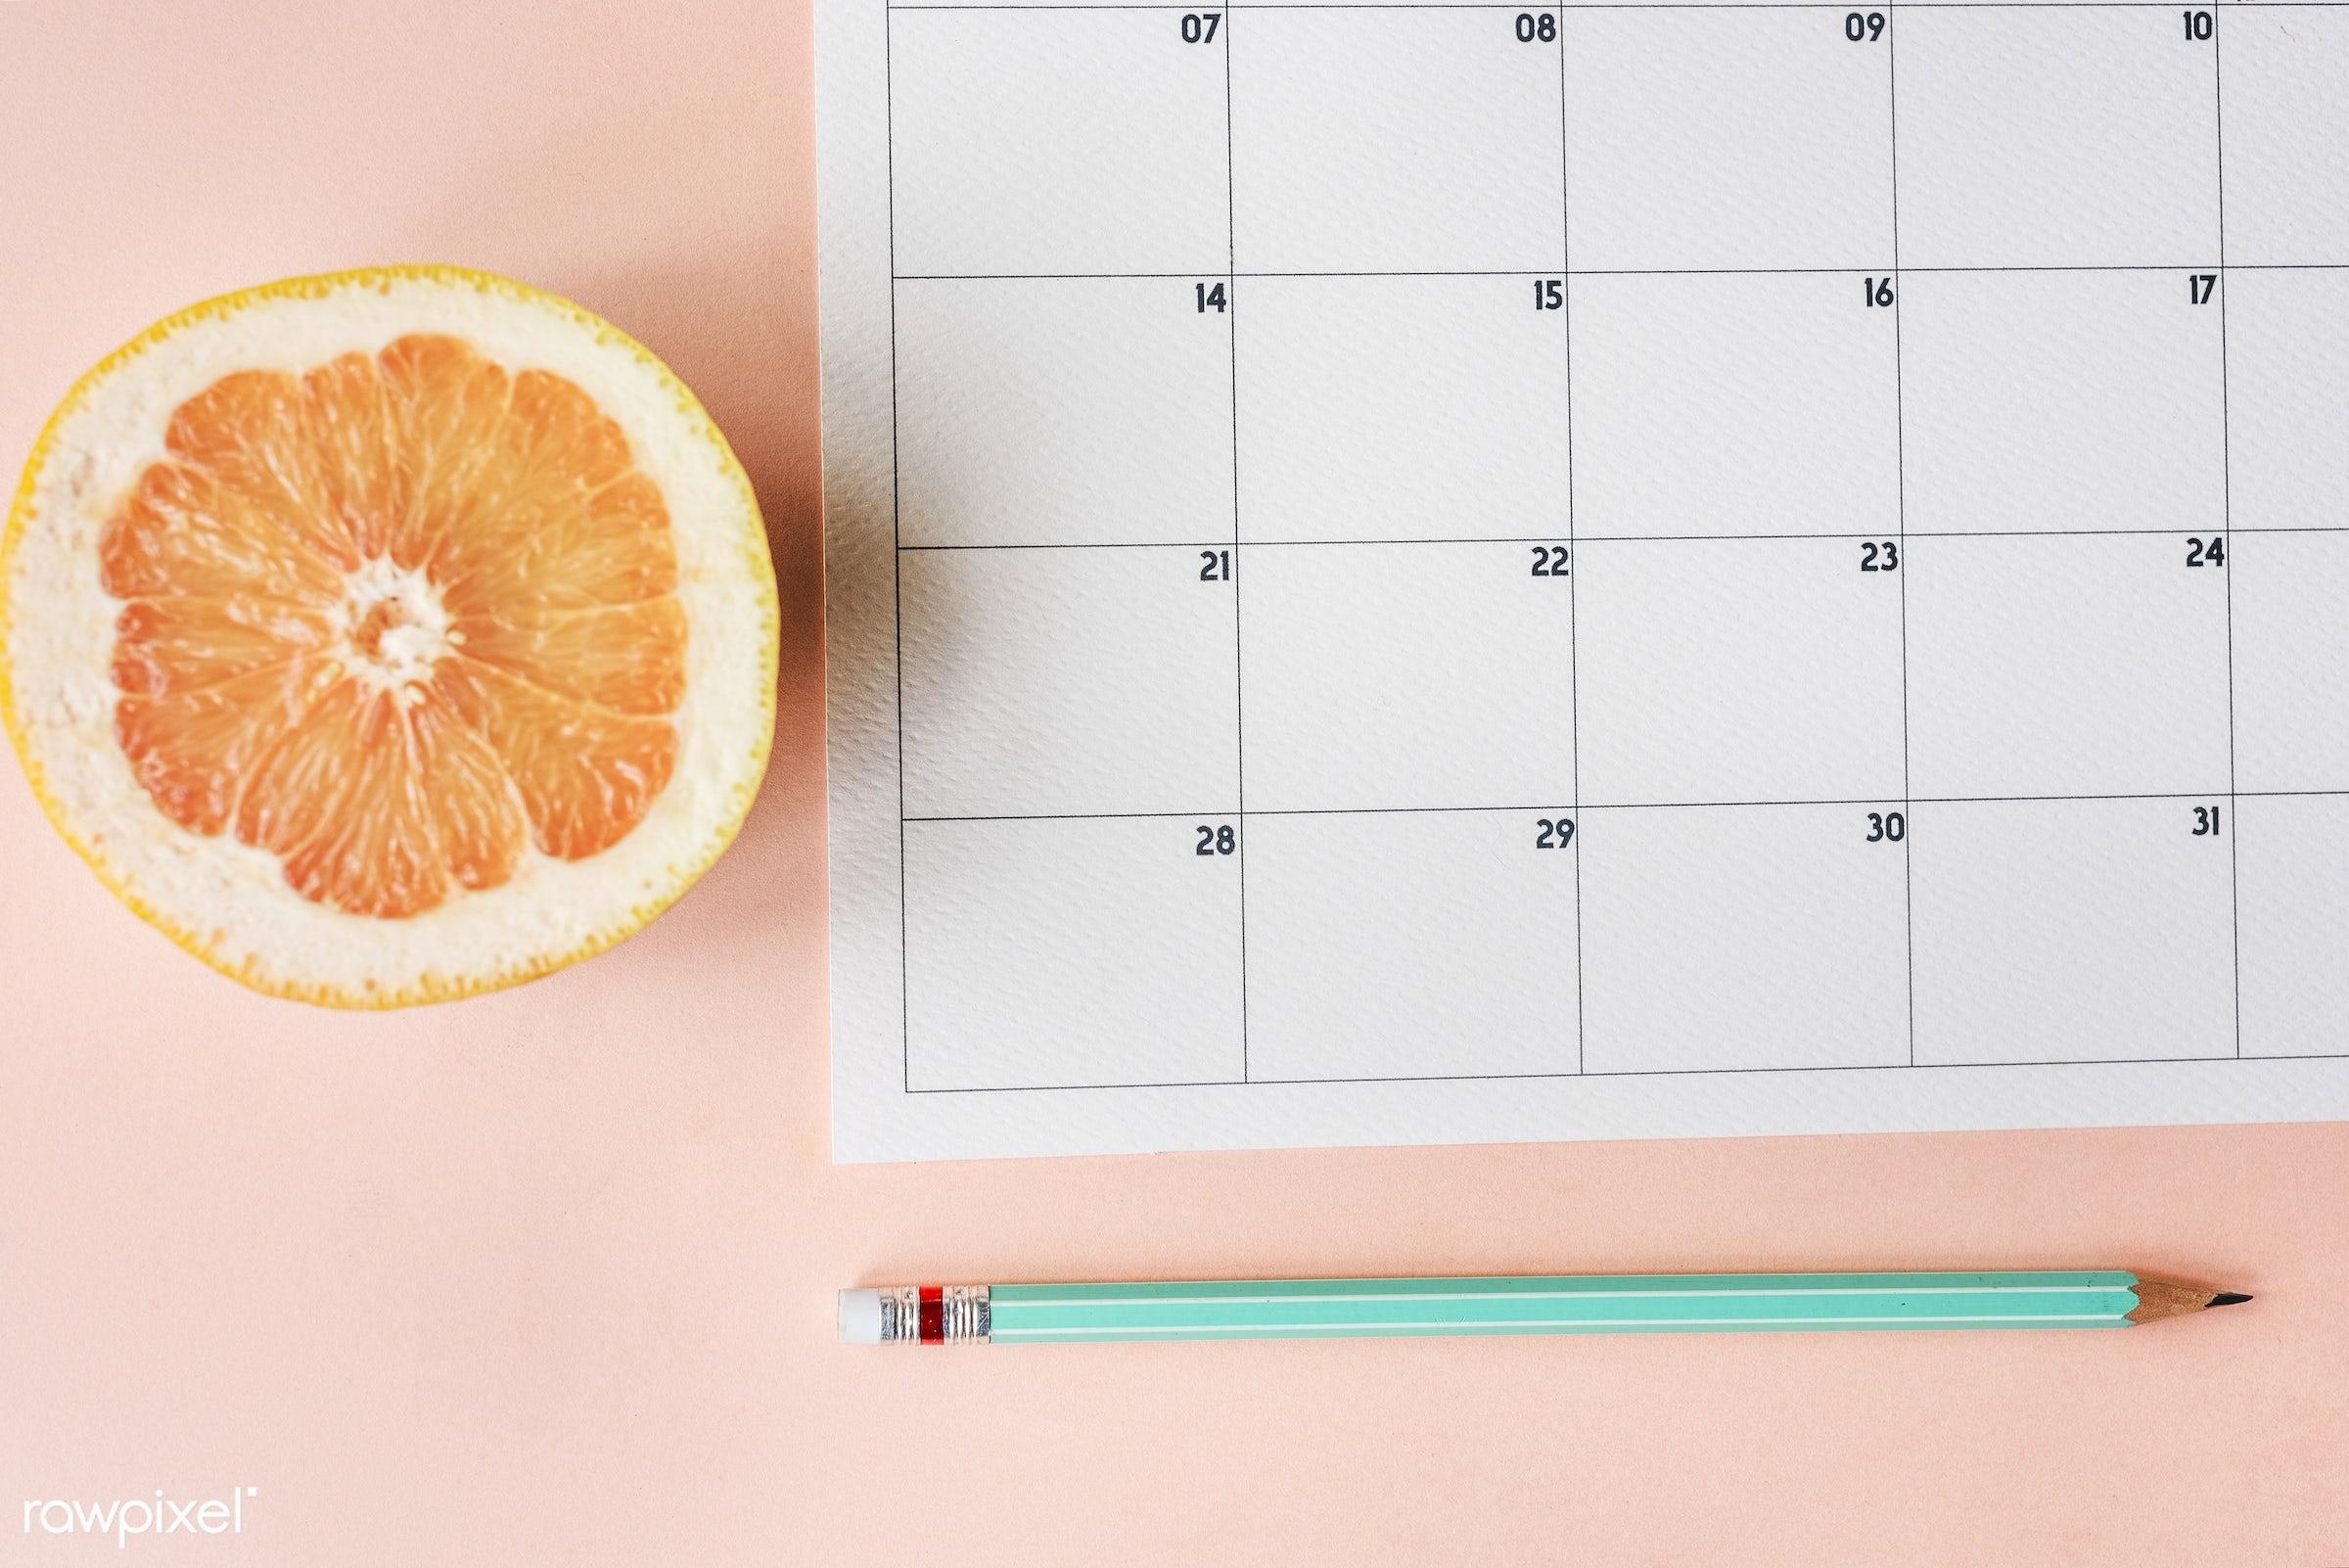 nobody, reminder, memo, data, organize, date, space, event, to do list, note, calendar, agenda, information, orange, fruit,...